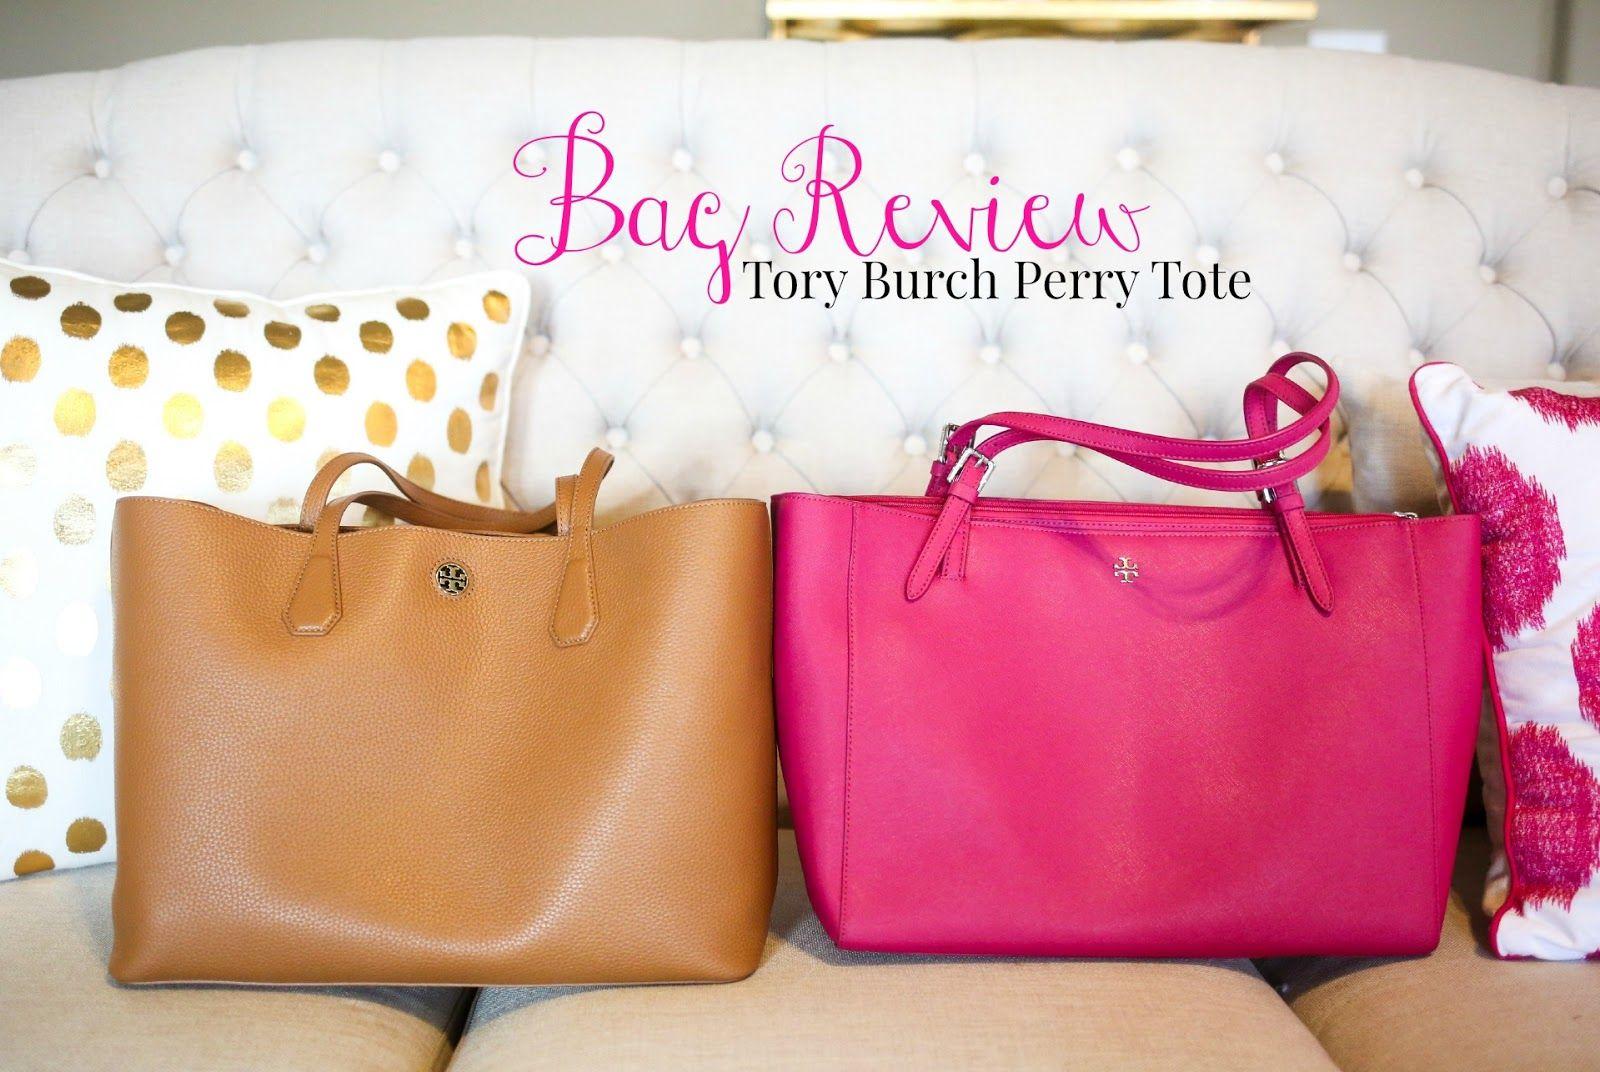 7e96edb3f5e The Sweetest Thing  Tory Burch Bag Review